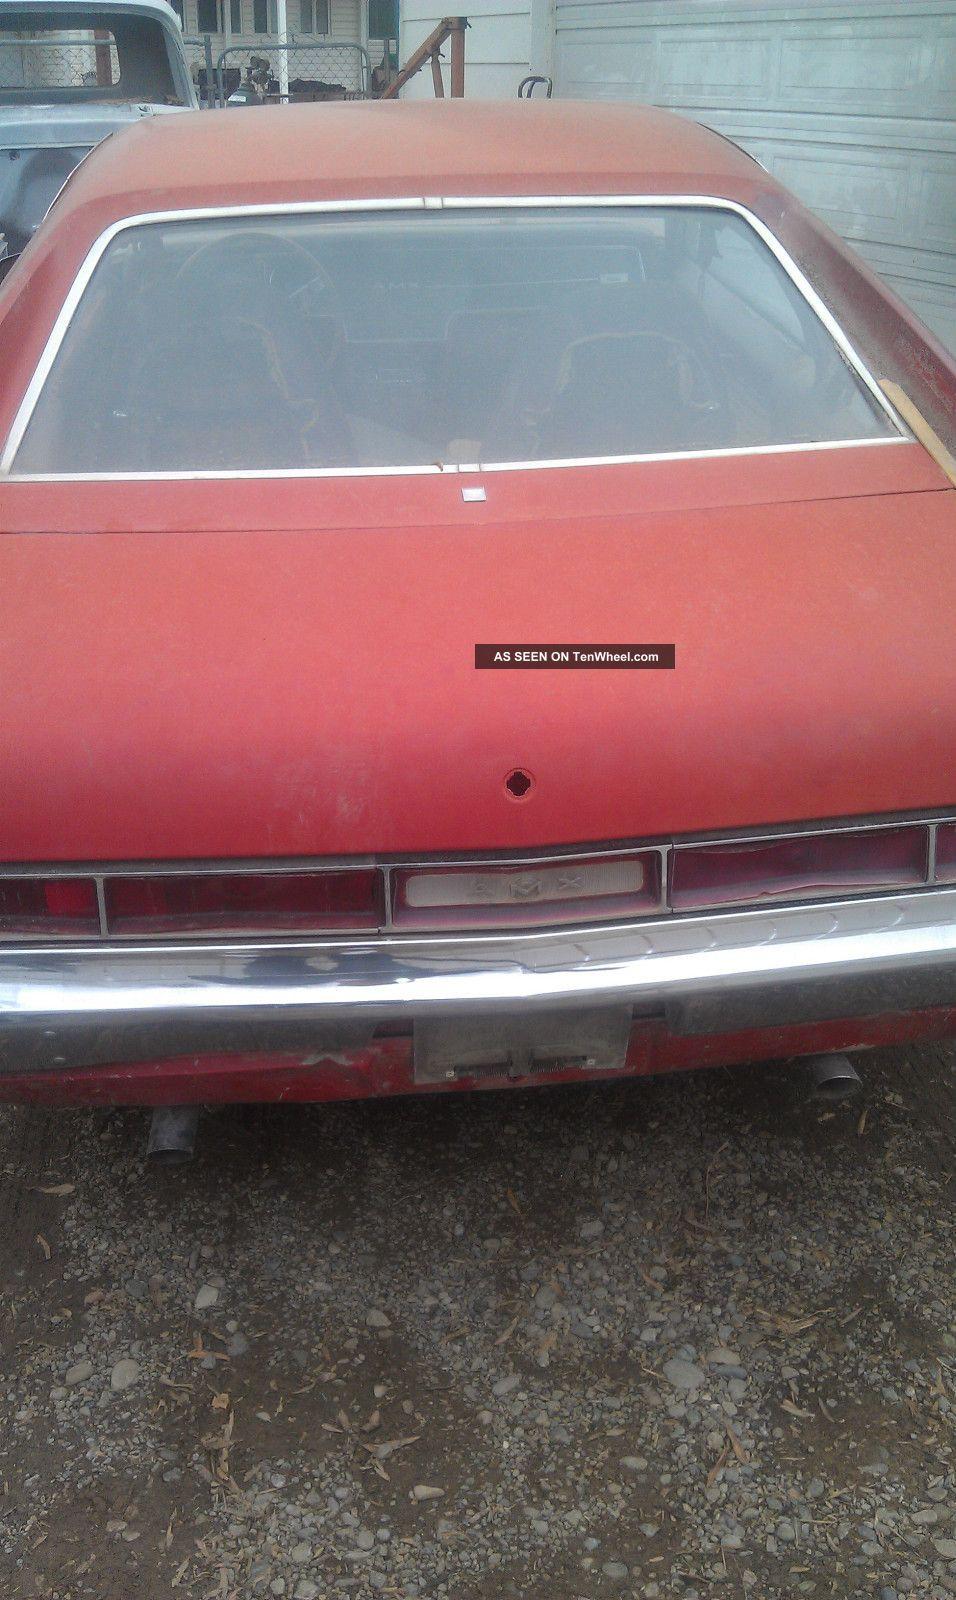 1970 Amx 390 4 Speed Rare Barn Find Make Drag Car Or Race Car 70 AMC photo